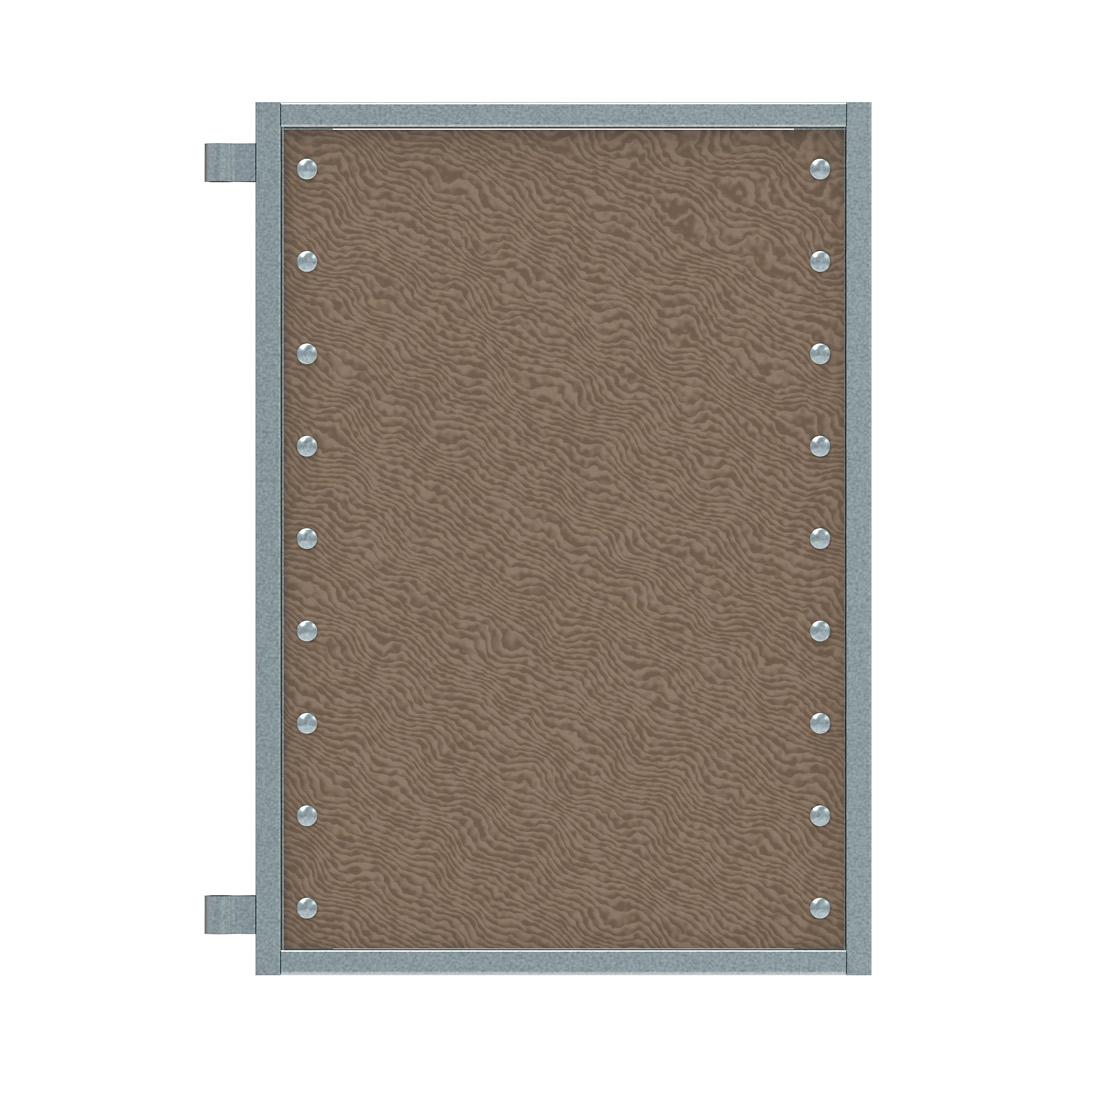 Sheepyard gate 600mm x 850mm (frame only)